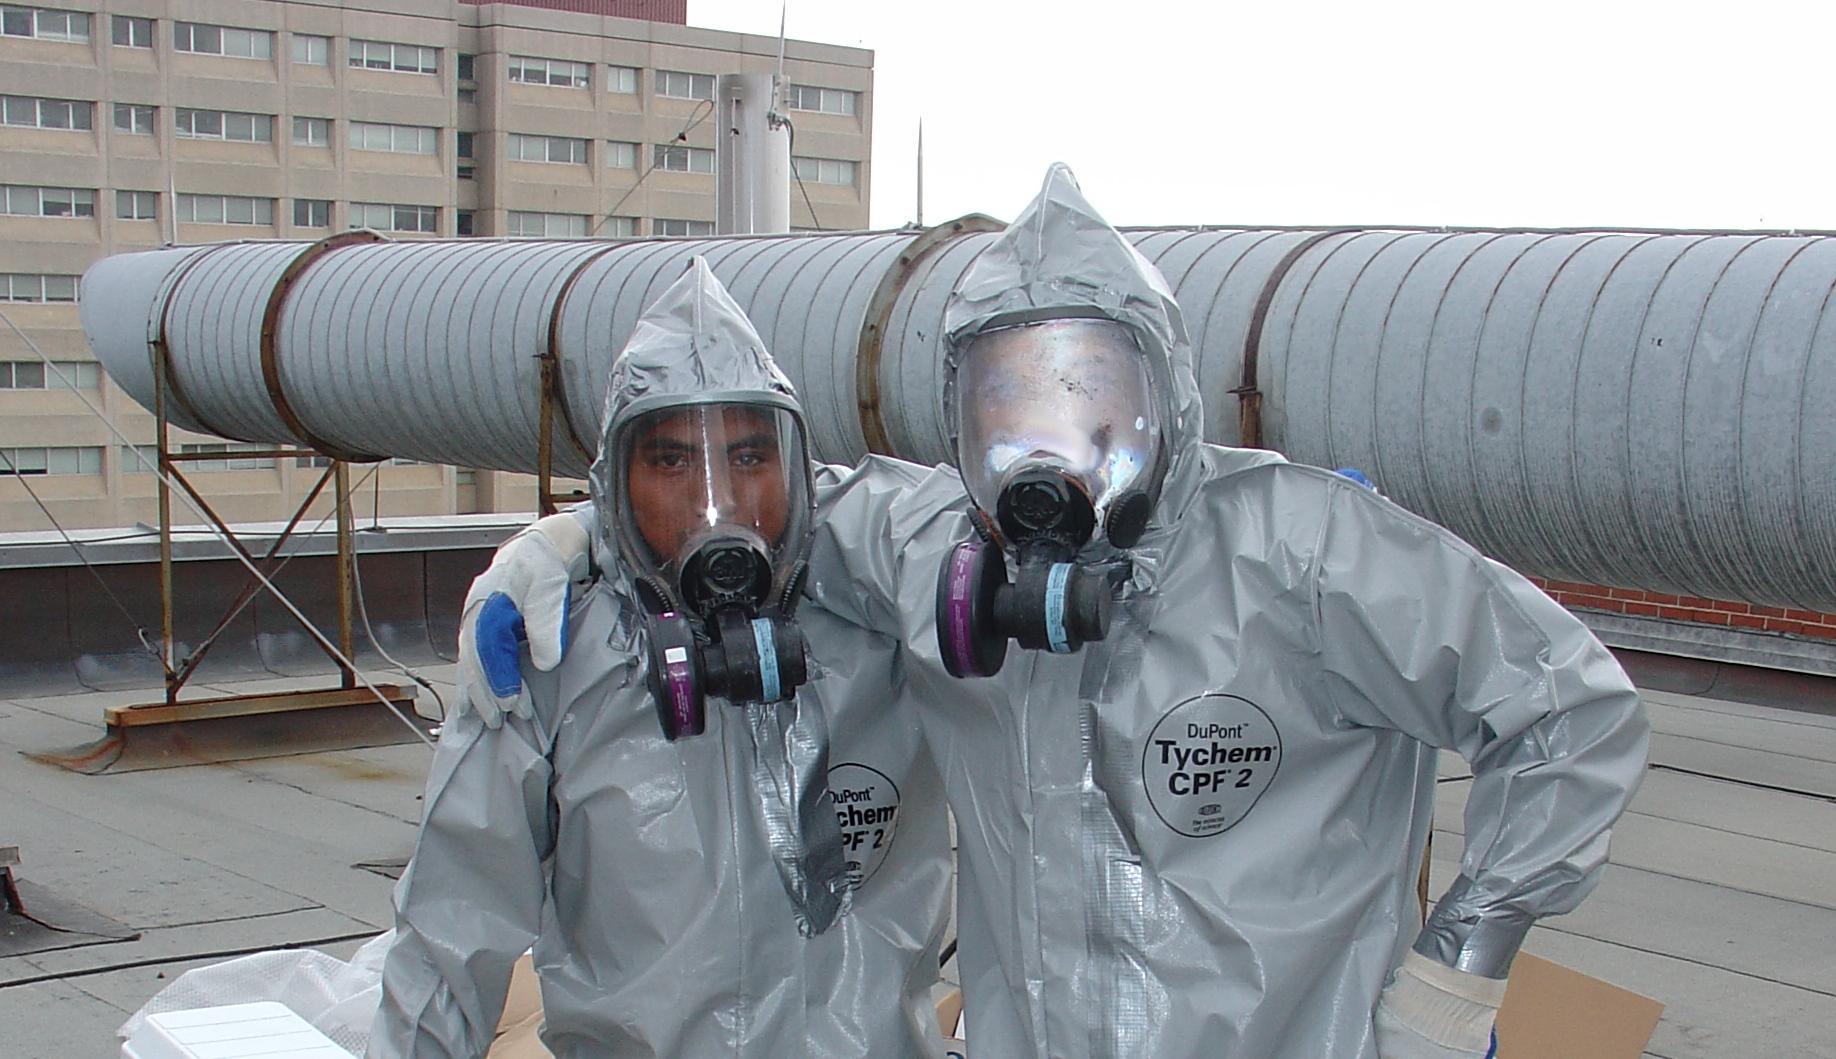 PPE Smaller